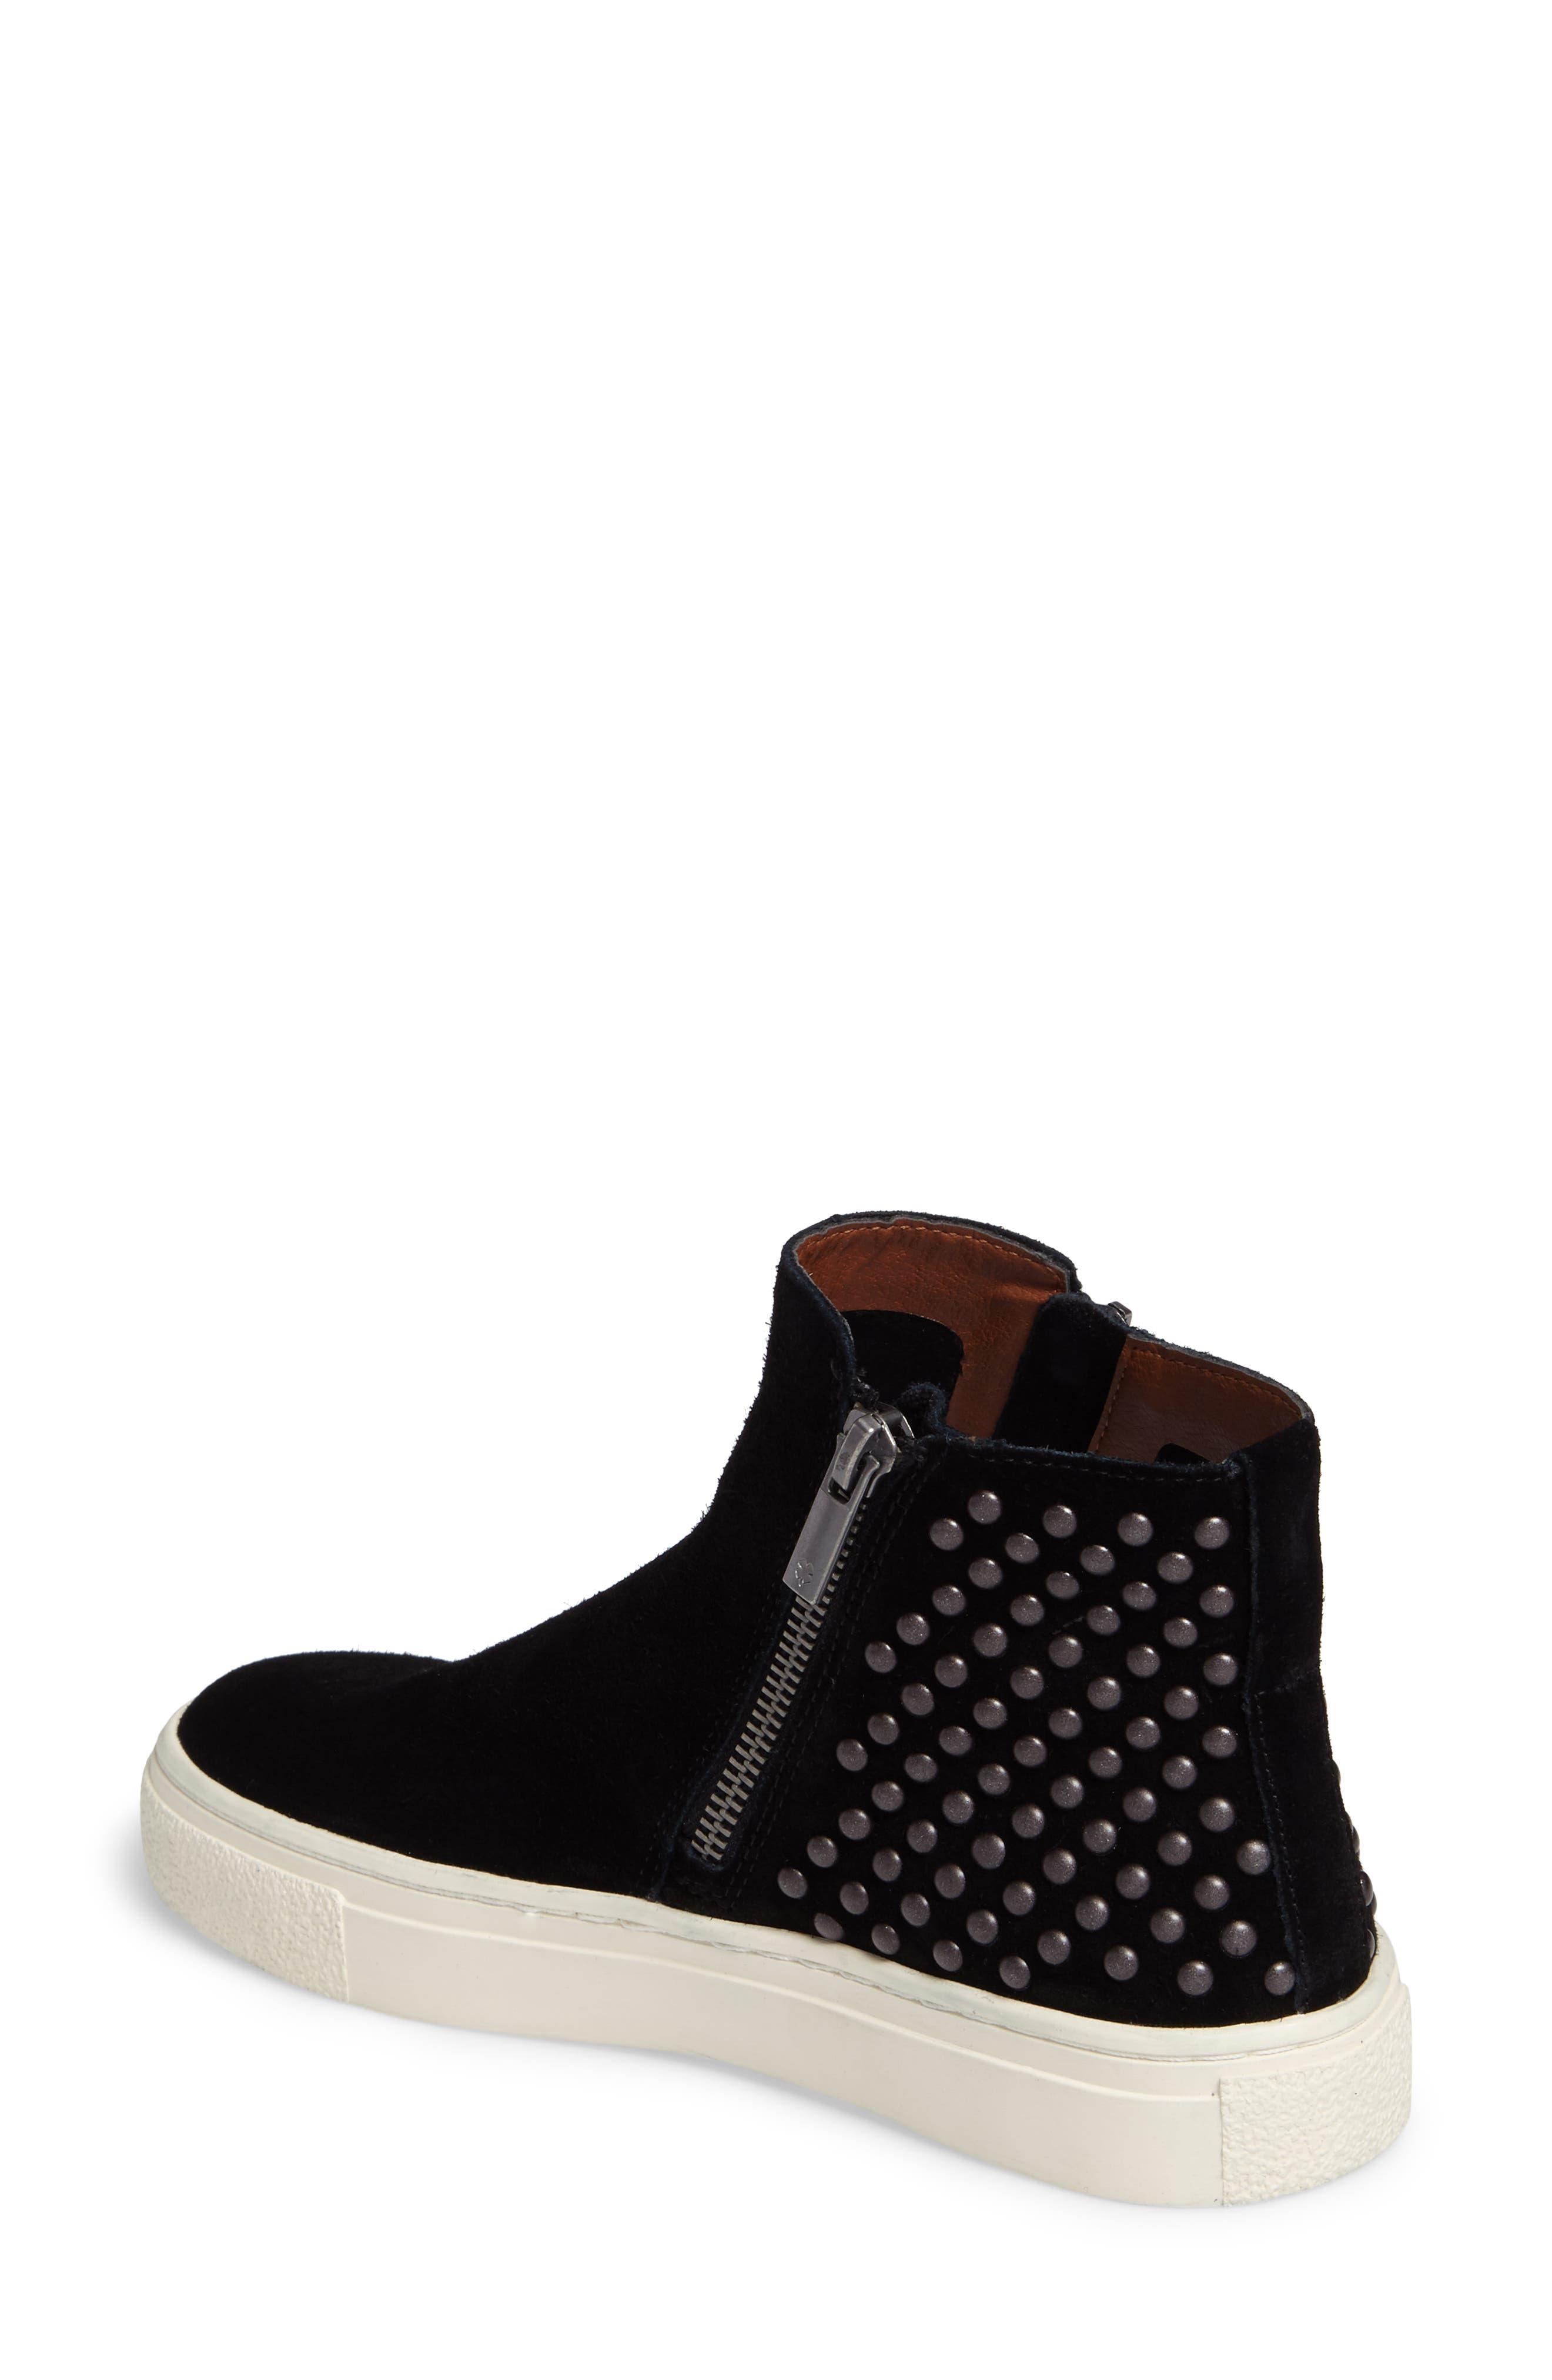 Bayleah High Top Sneaker,                             Alternate thumbnail 2, color,                             001